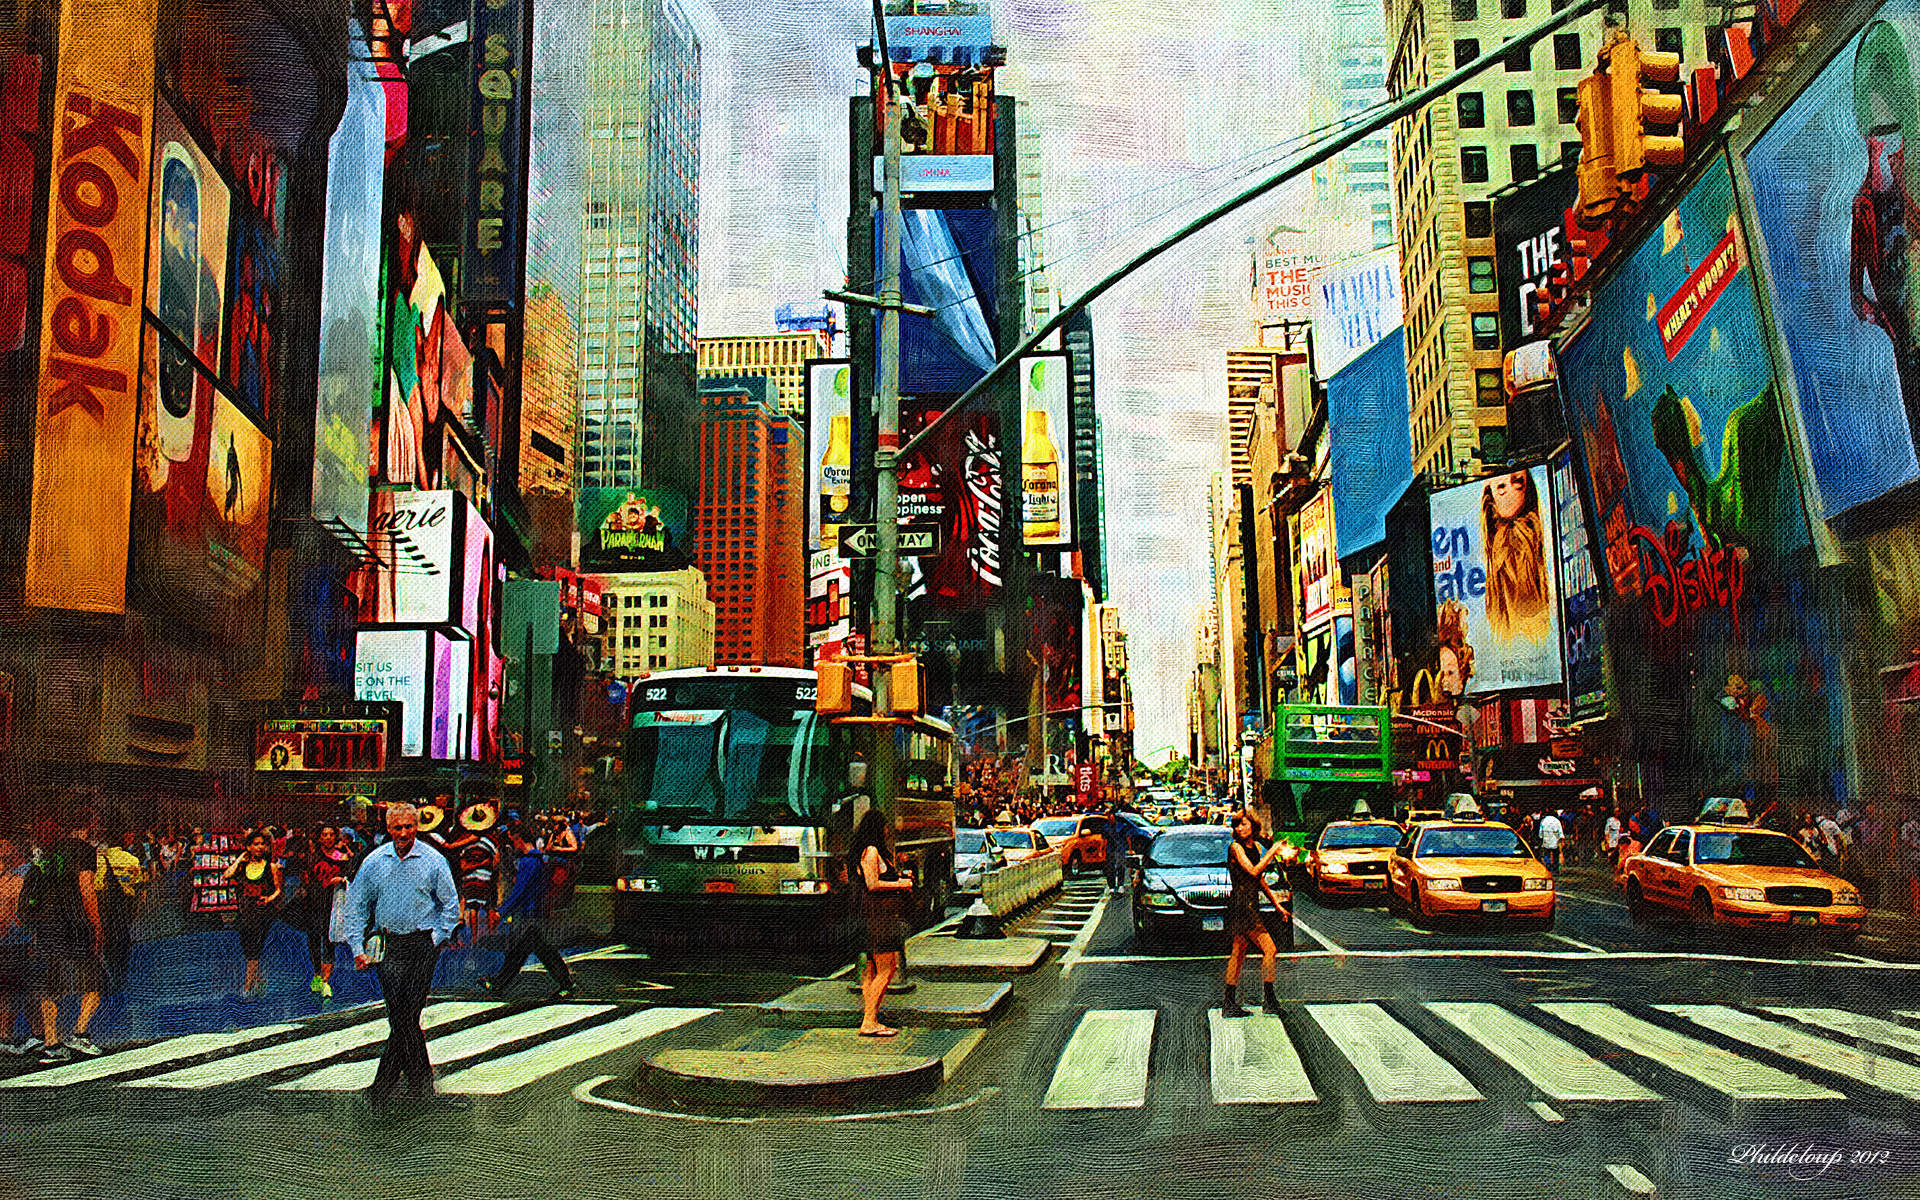 Free Download New York Hd Wallpaper 1080p Hd Wallpaper 1920x1200 For Your Desktop Mobile Tablet Explore 26 New York Wallpaper Hd 1080p New York Wallpaper Hd 1080p New York